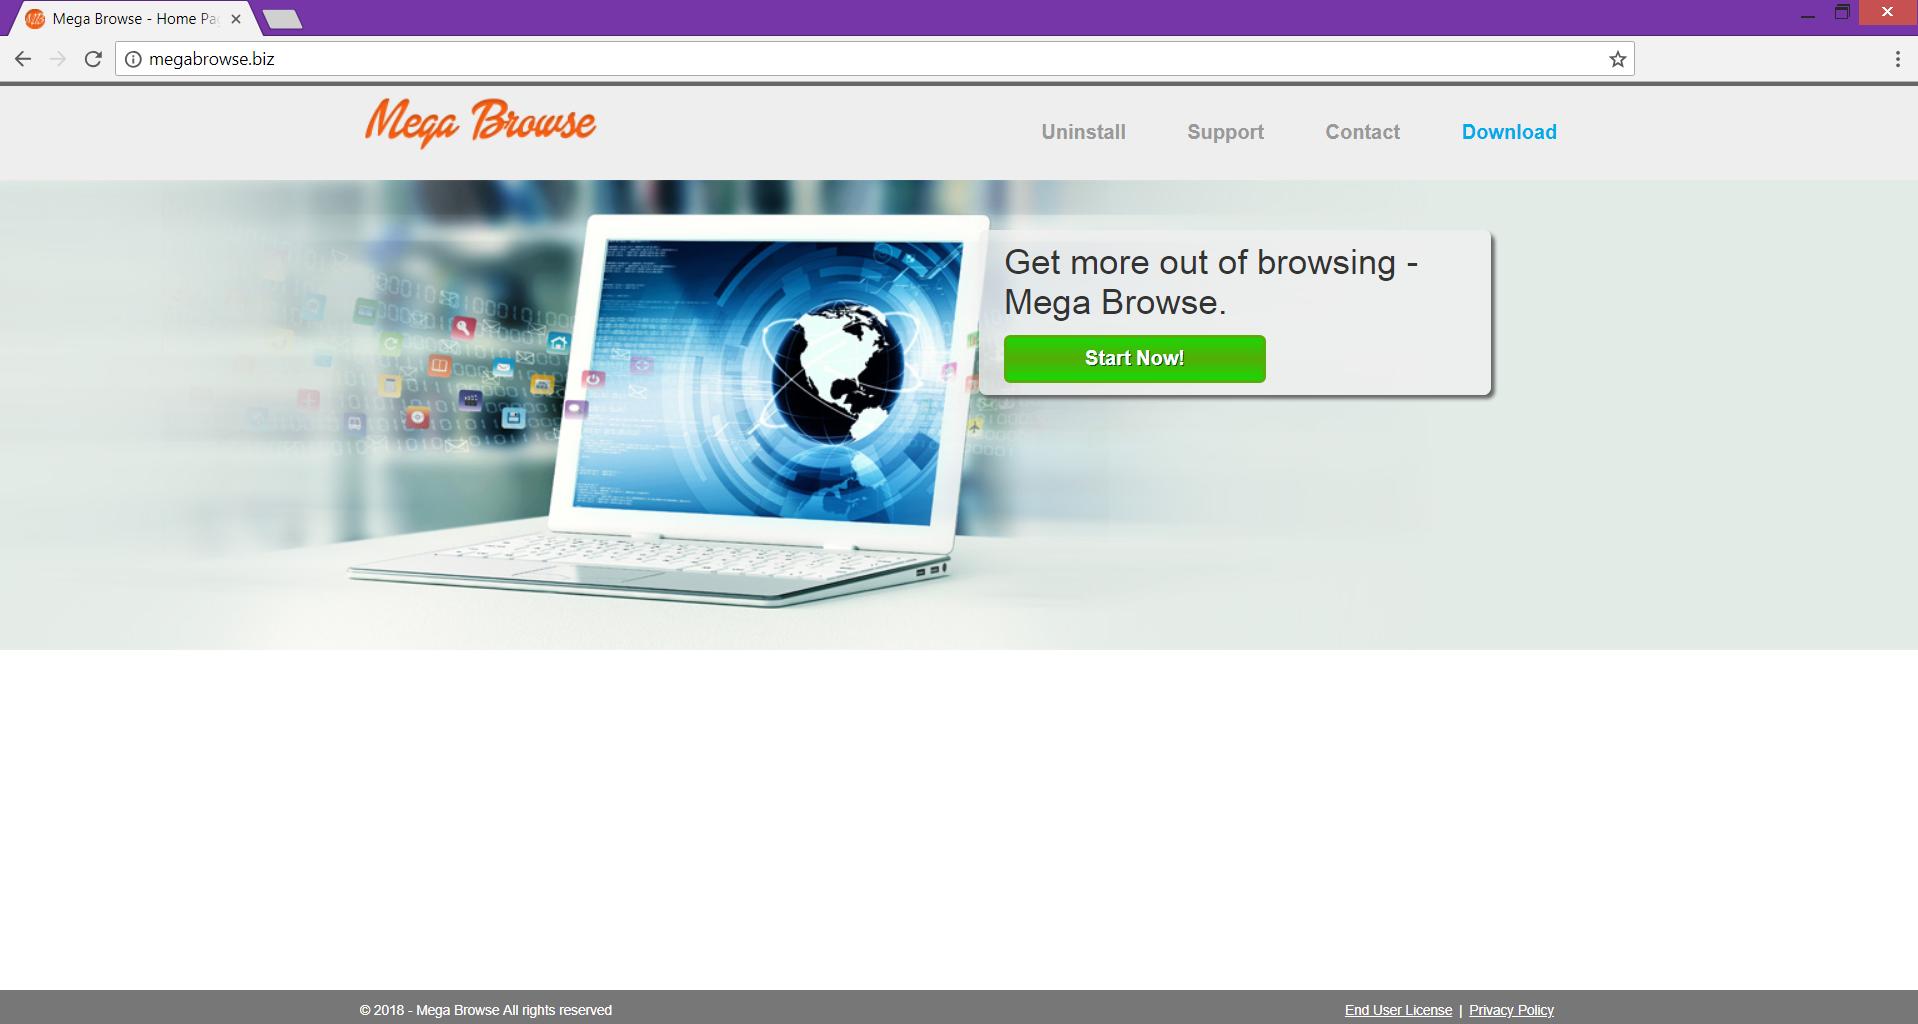 megabrowse.biz official website of mega browse extension